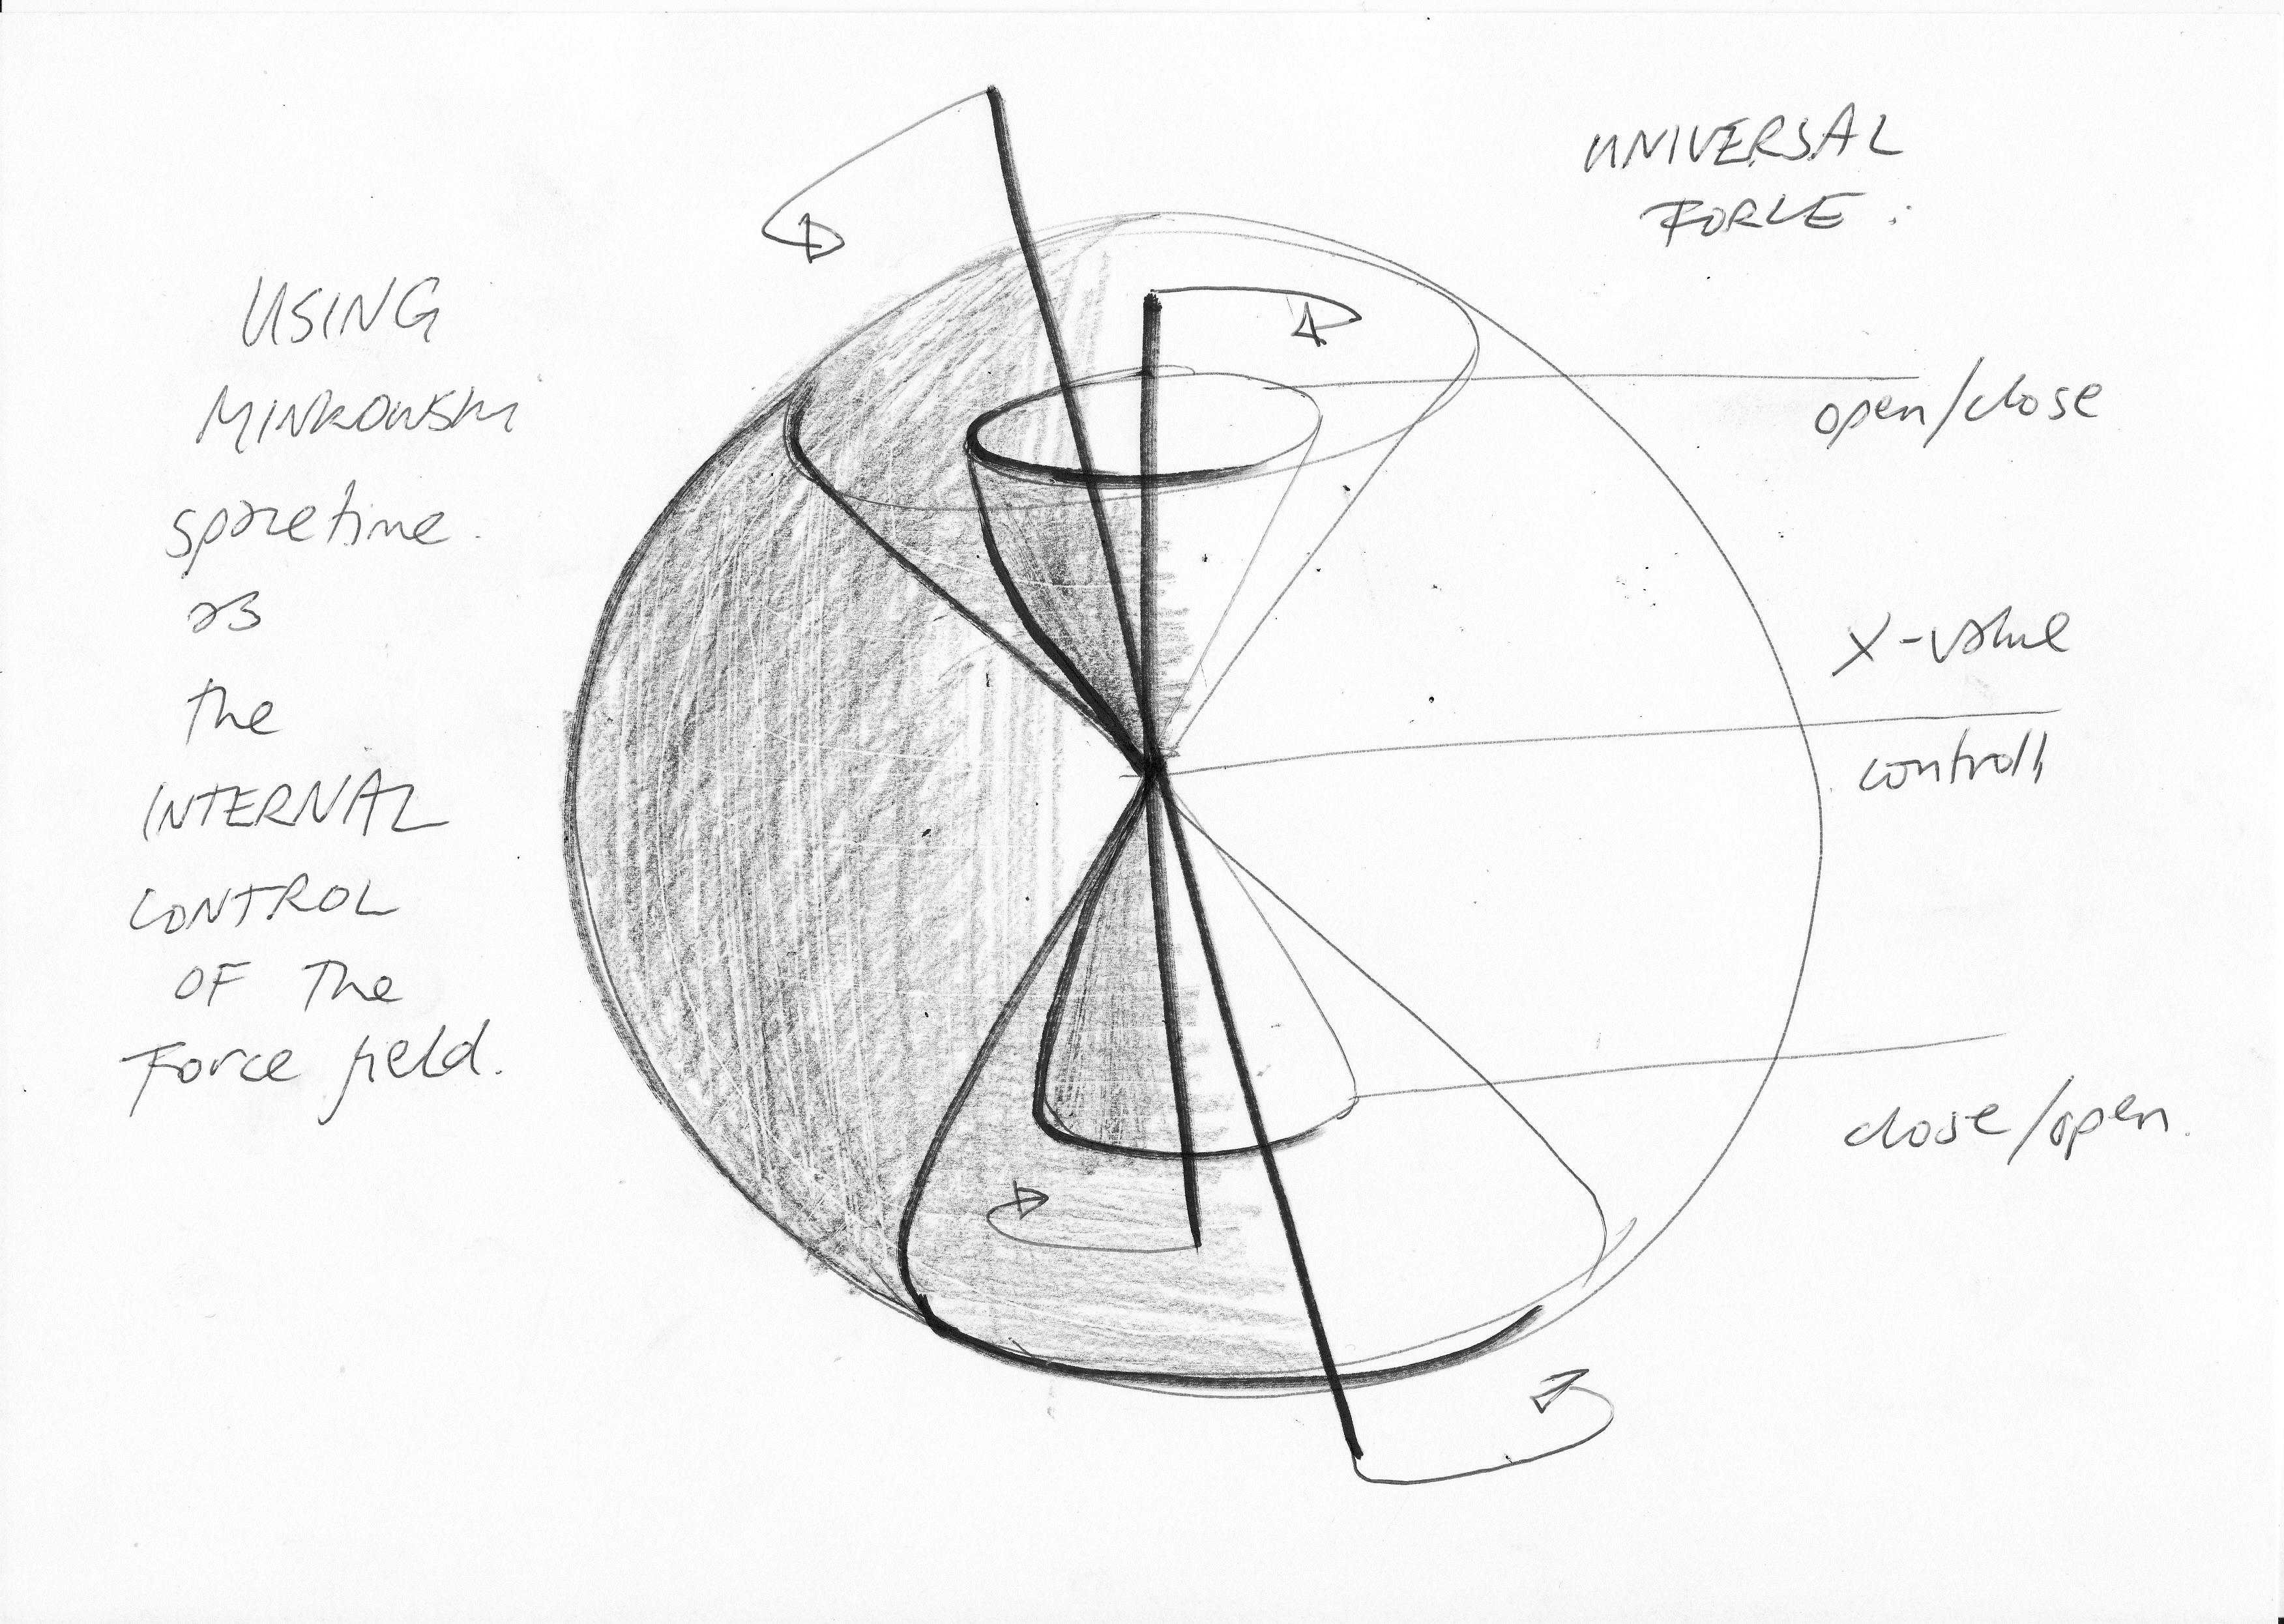 Sci Fi Reality Ti Matter Force Fields D Torodial Jet